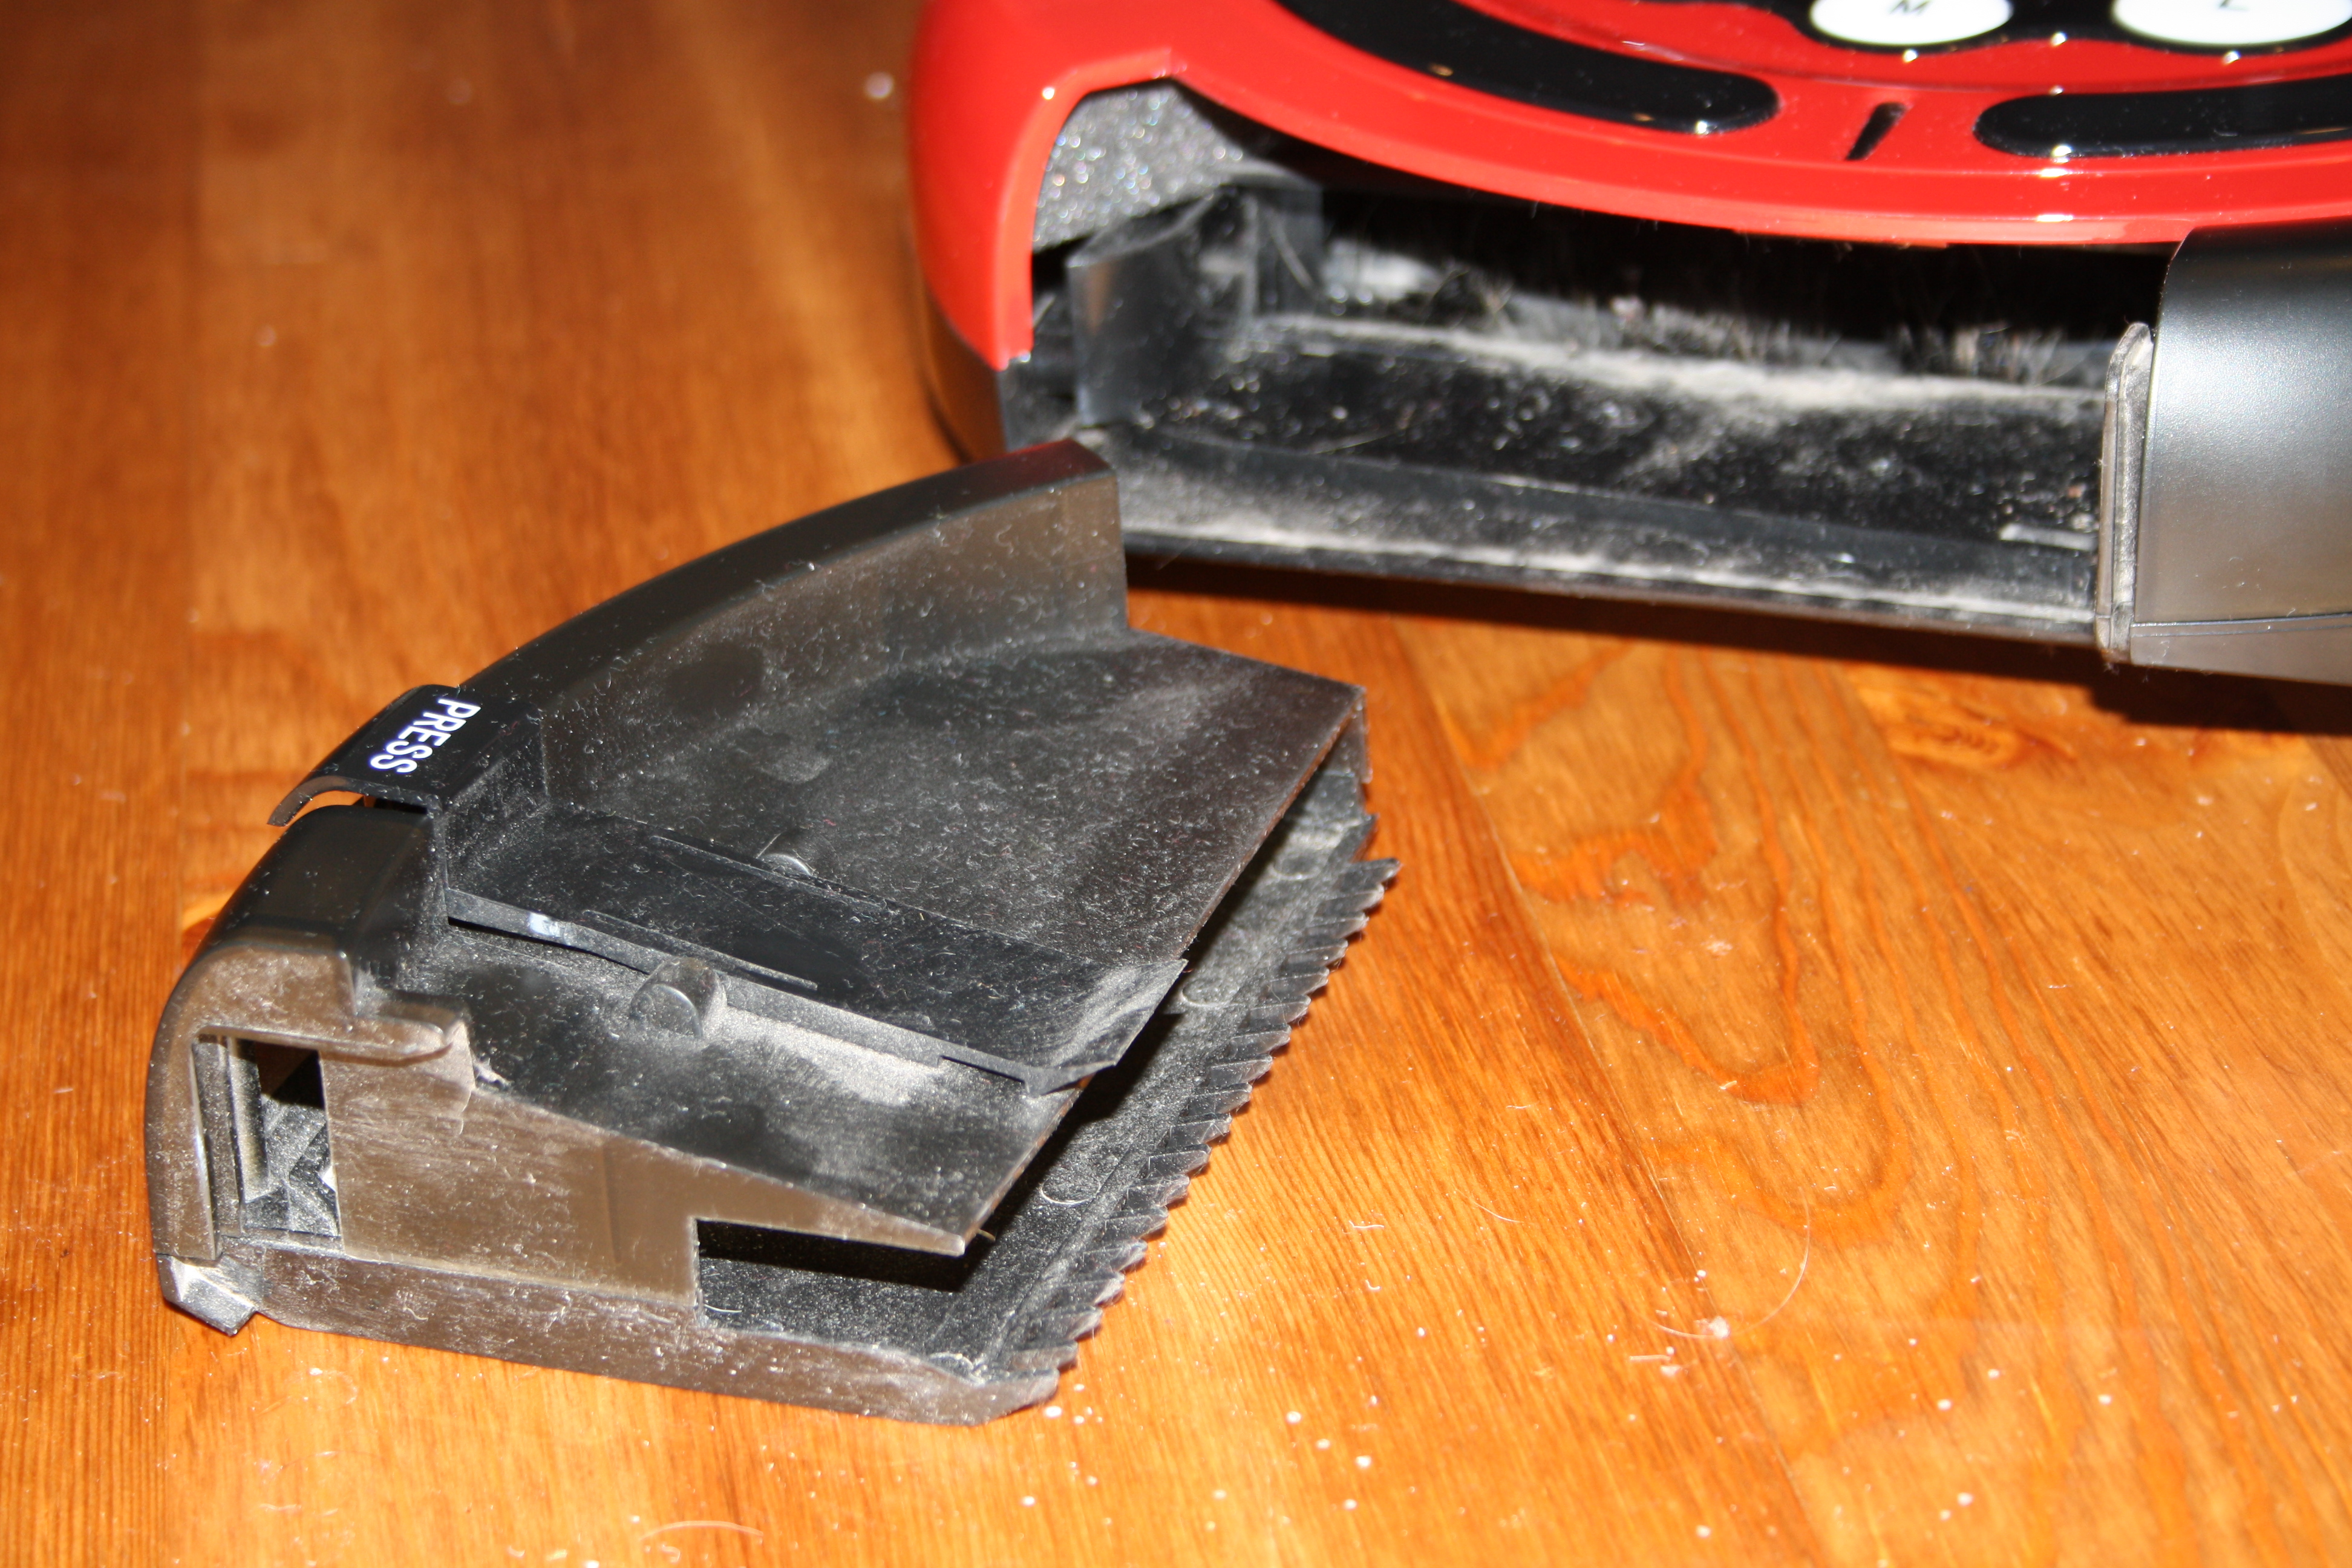 vileda cleaning robot dominic 39 s hackerspace blog. Black Bedroom Furniture Sets. Home Design Ideas